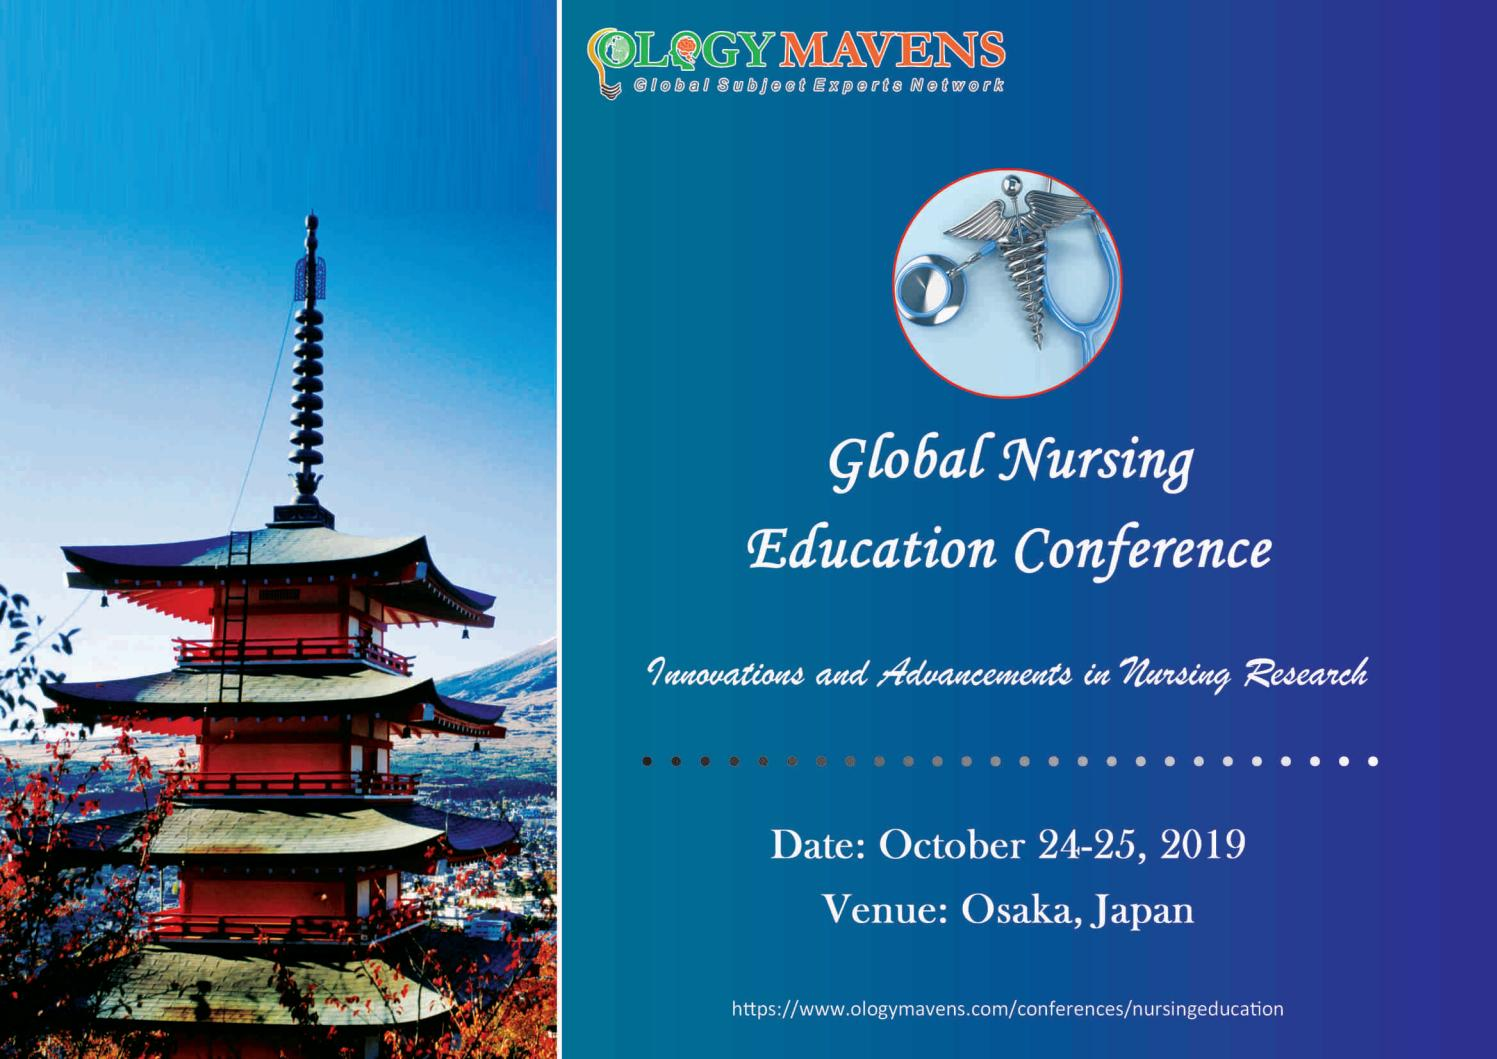 Nursing Education 2019 | Nursing Conferences 2019 by Ology